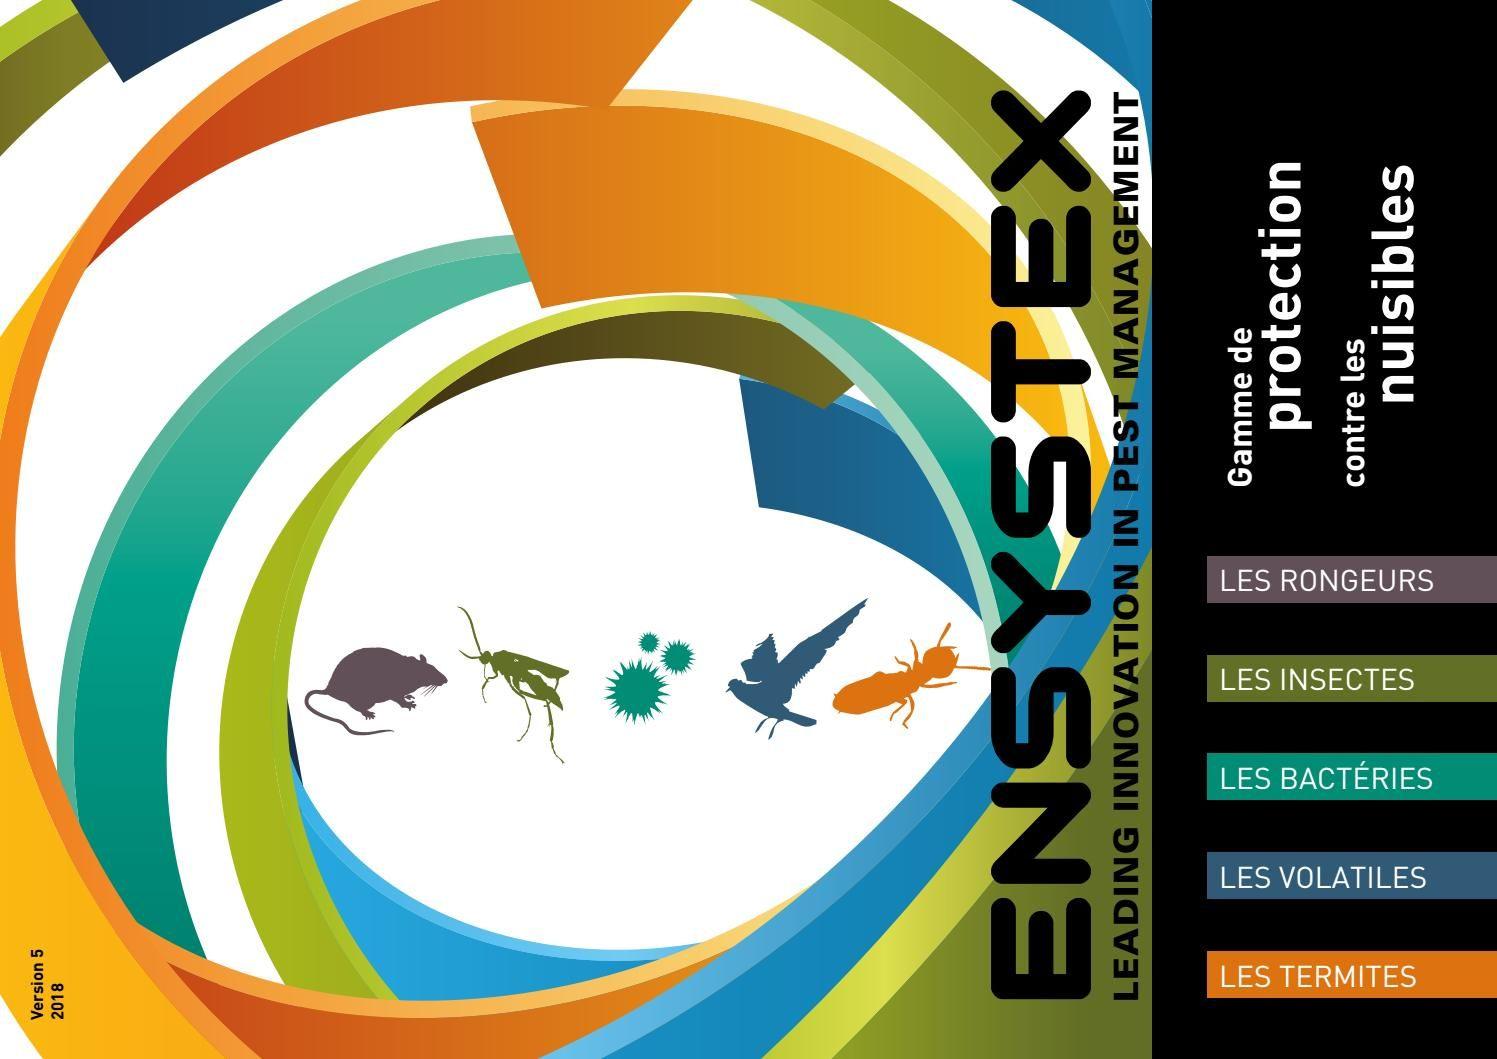 Exterminateur Punaise De Lit Paris Frais Catalogue Ensystex Europe 2018 by Ensystex Europe issuu